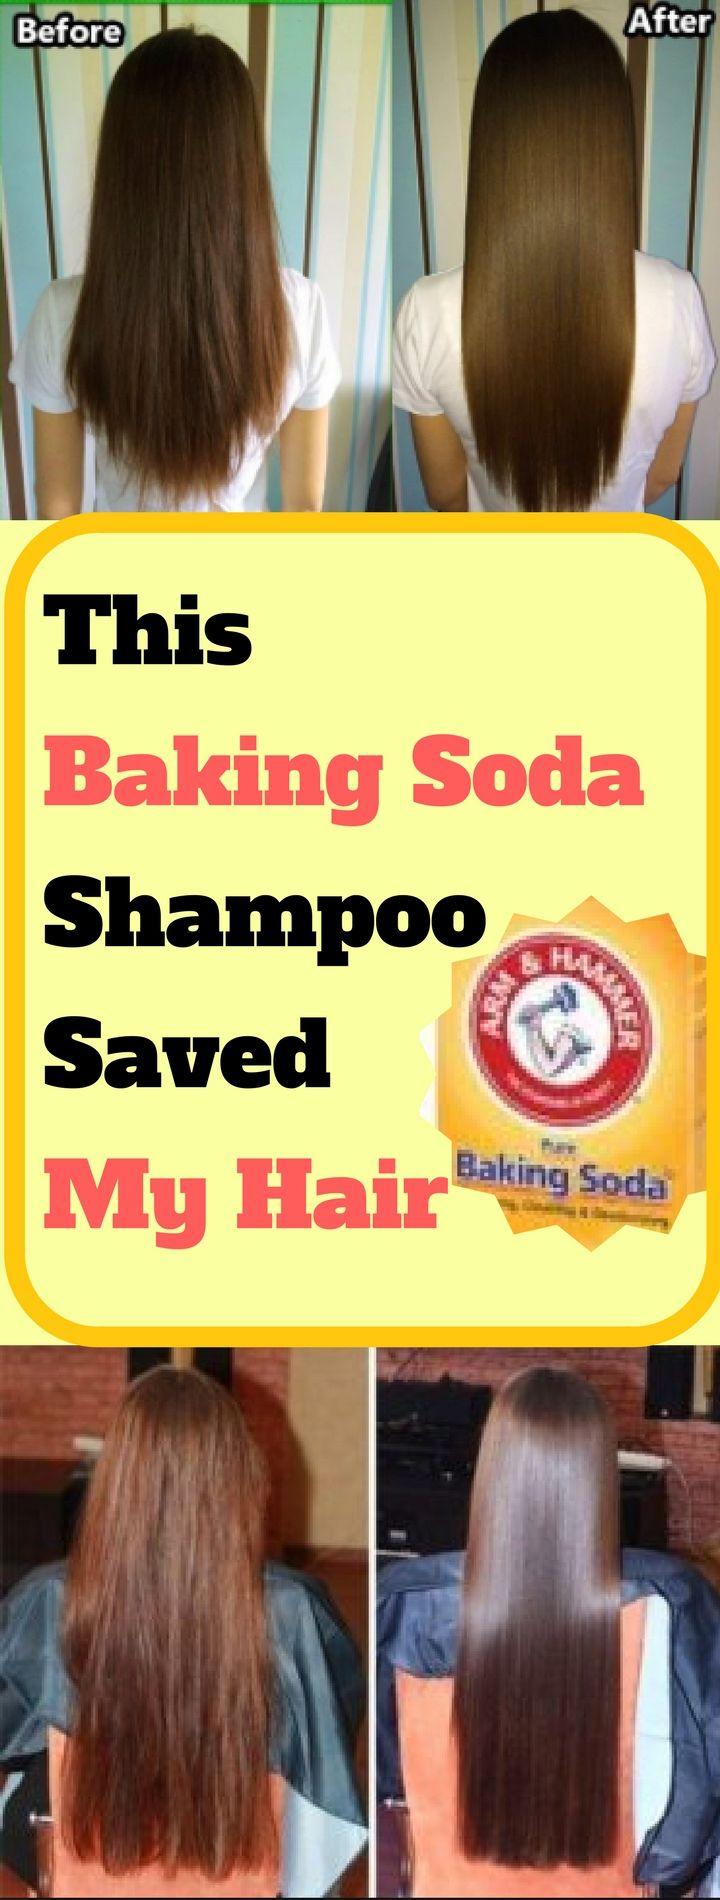 This Baking Soda Shampoo Saved My Hair..!